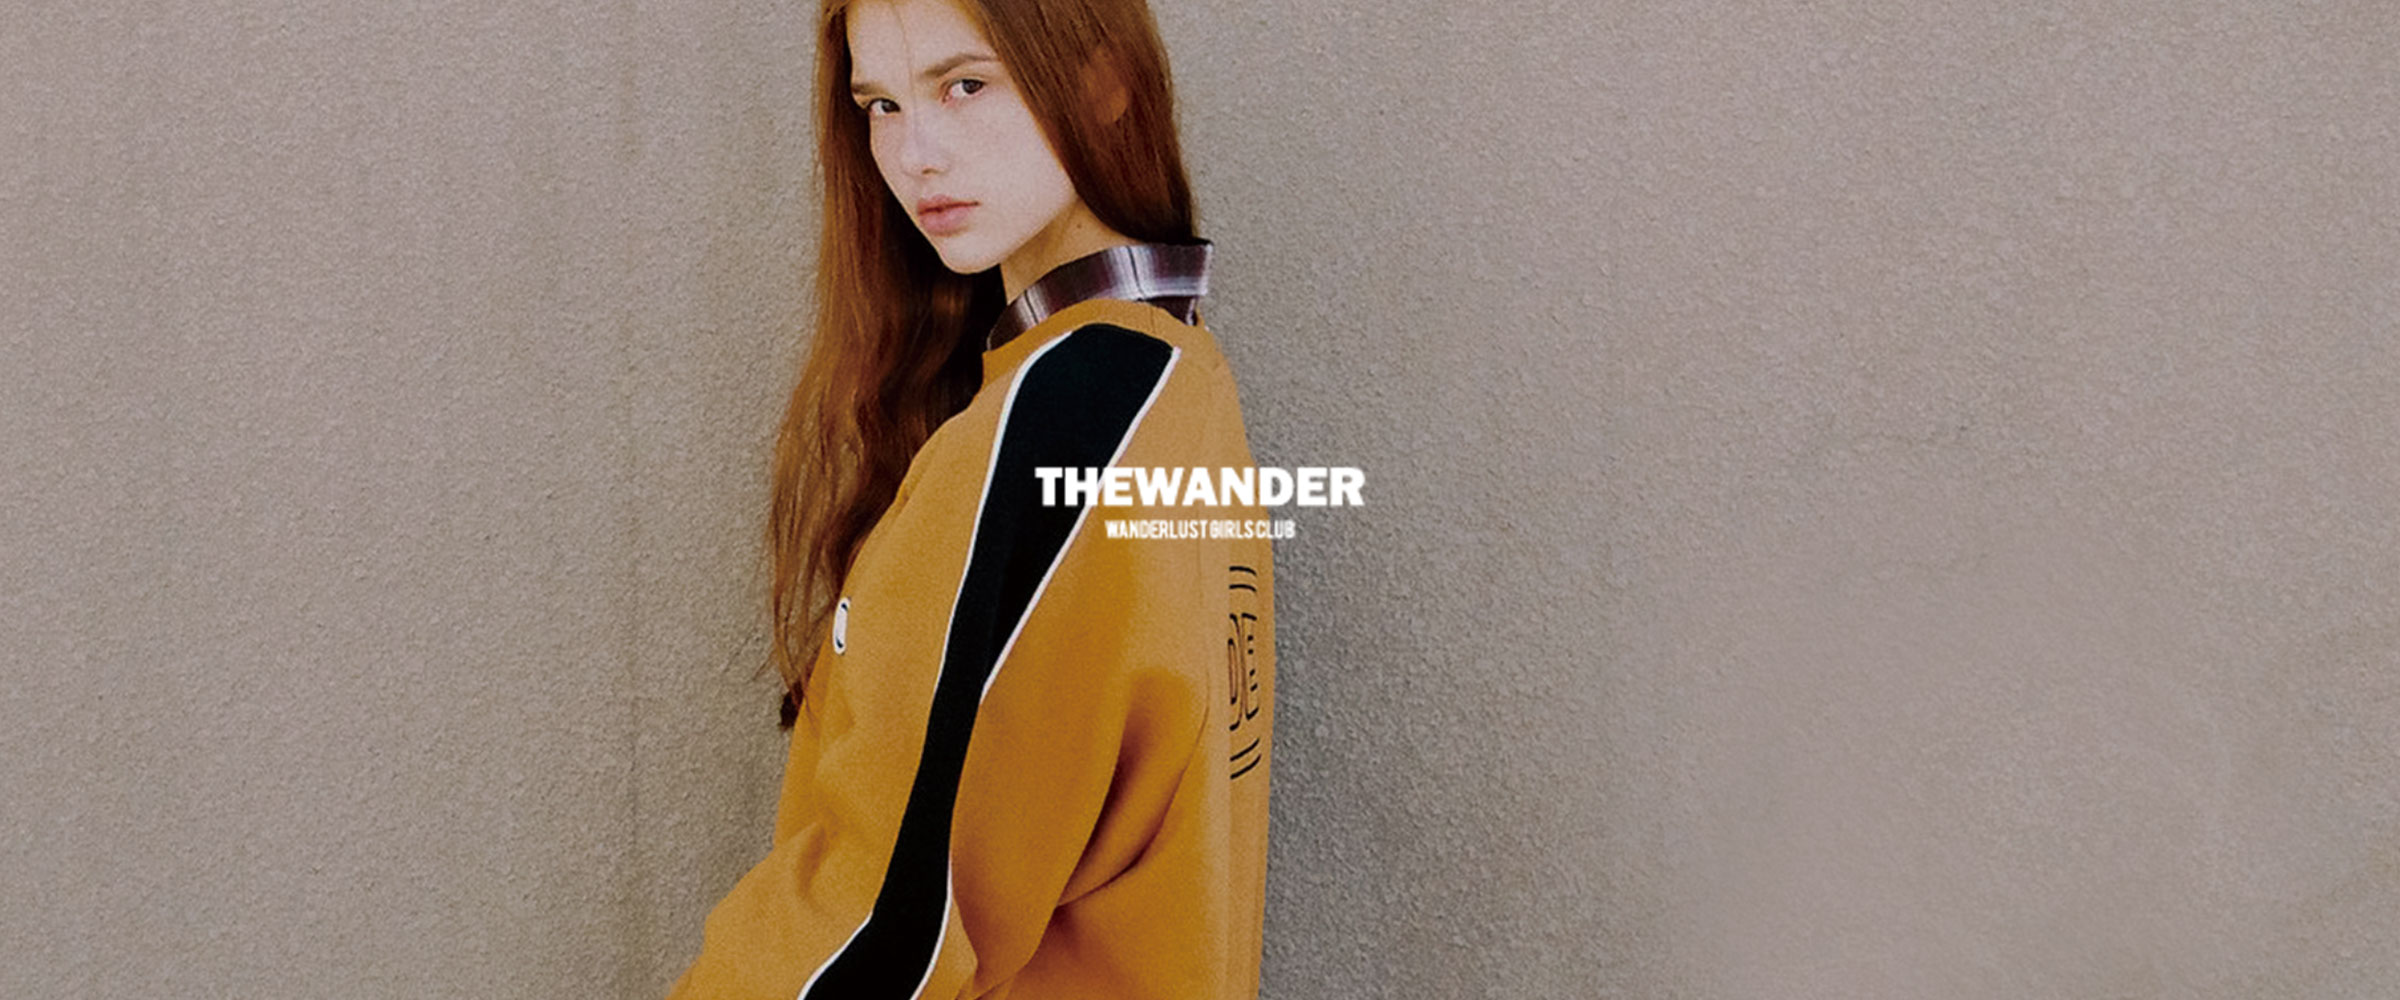 thewander.jpg